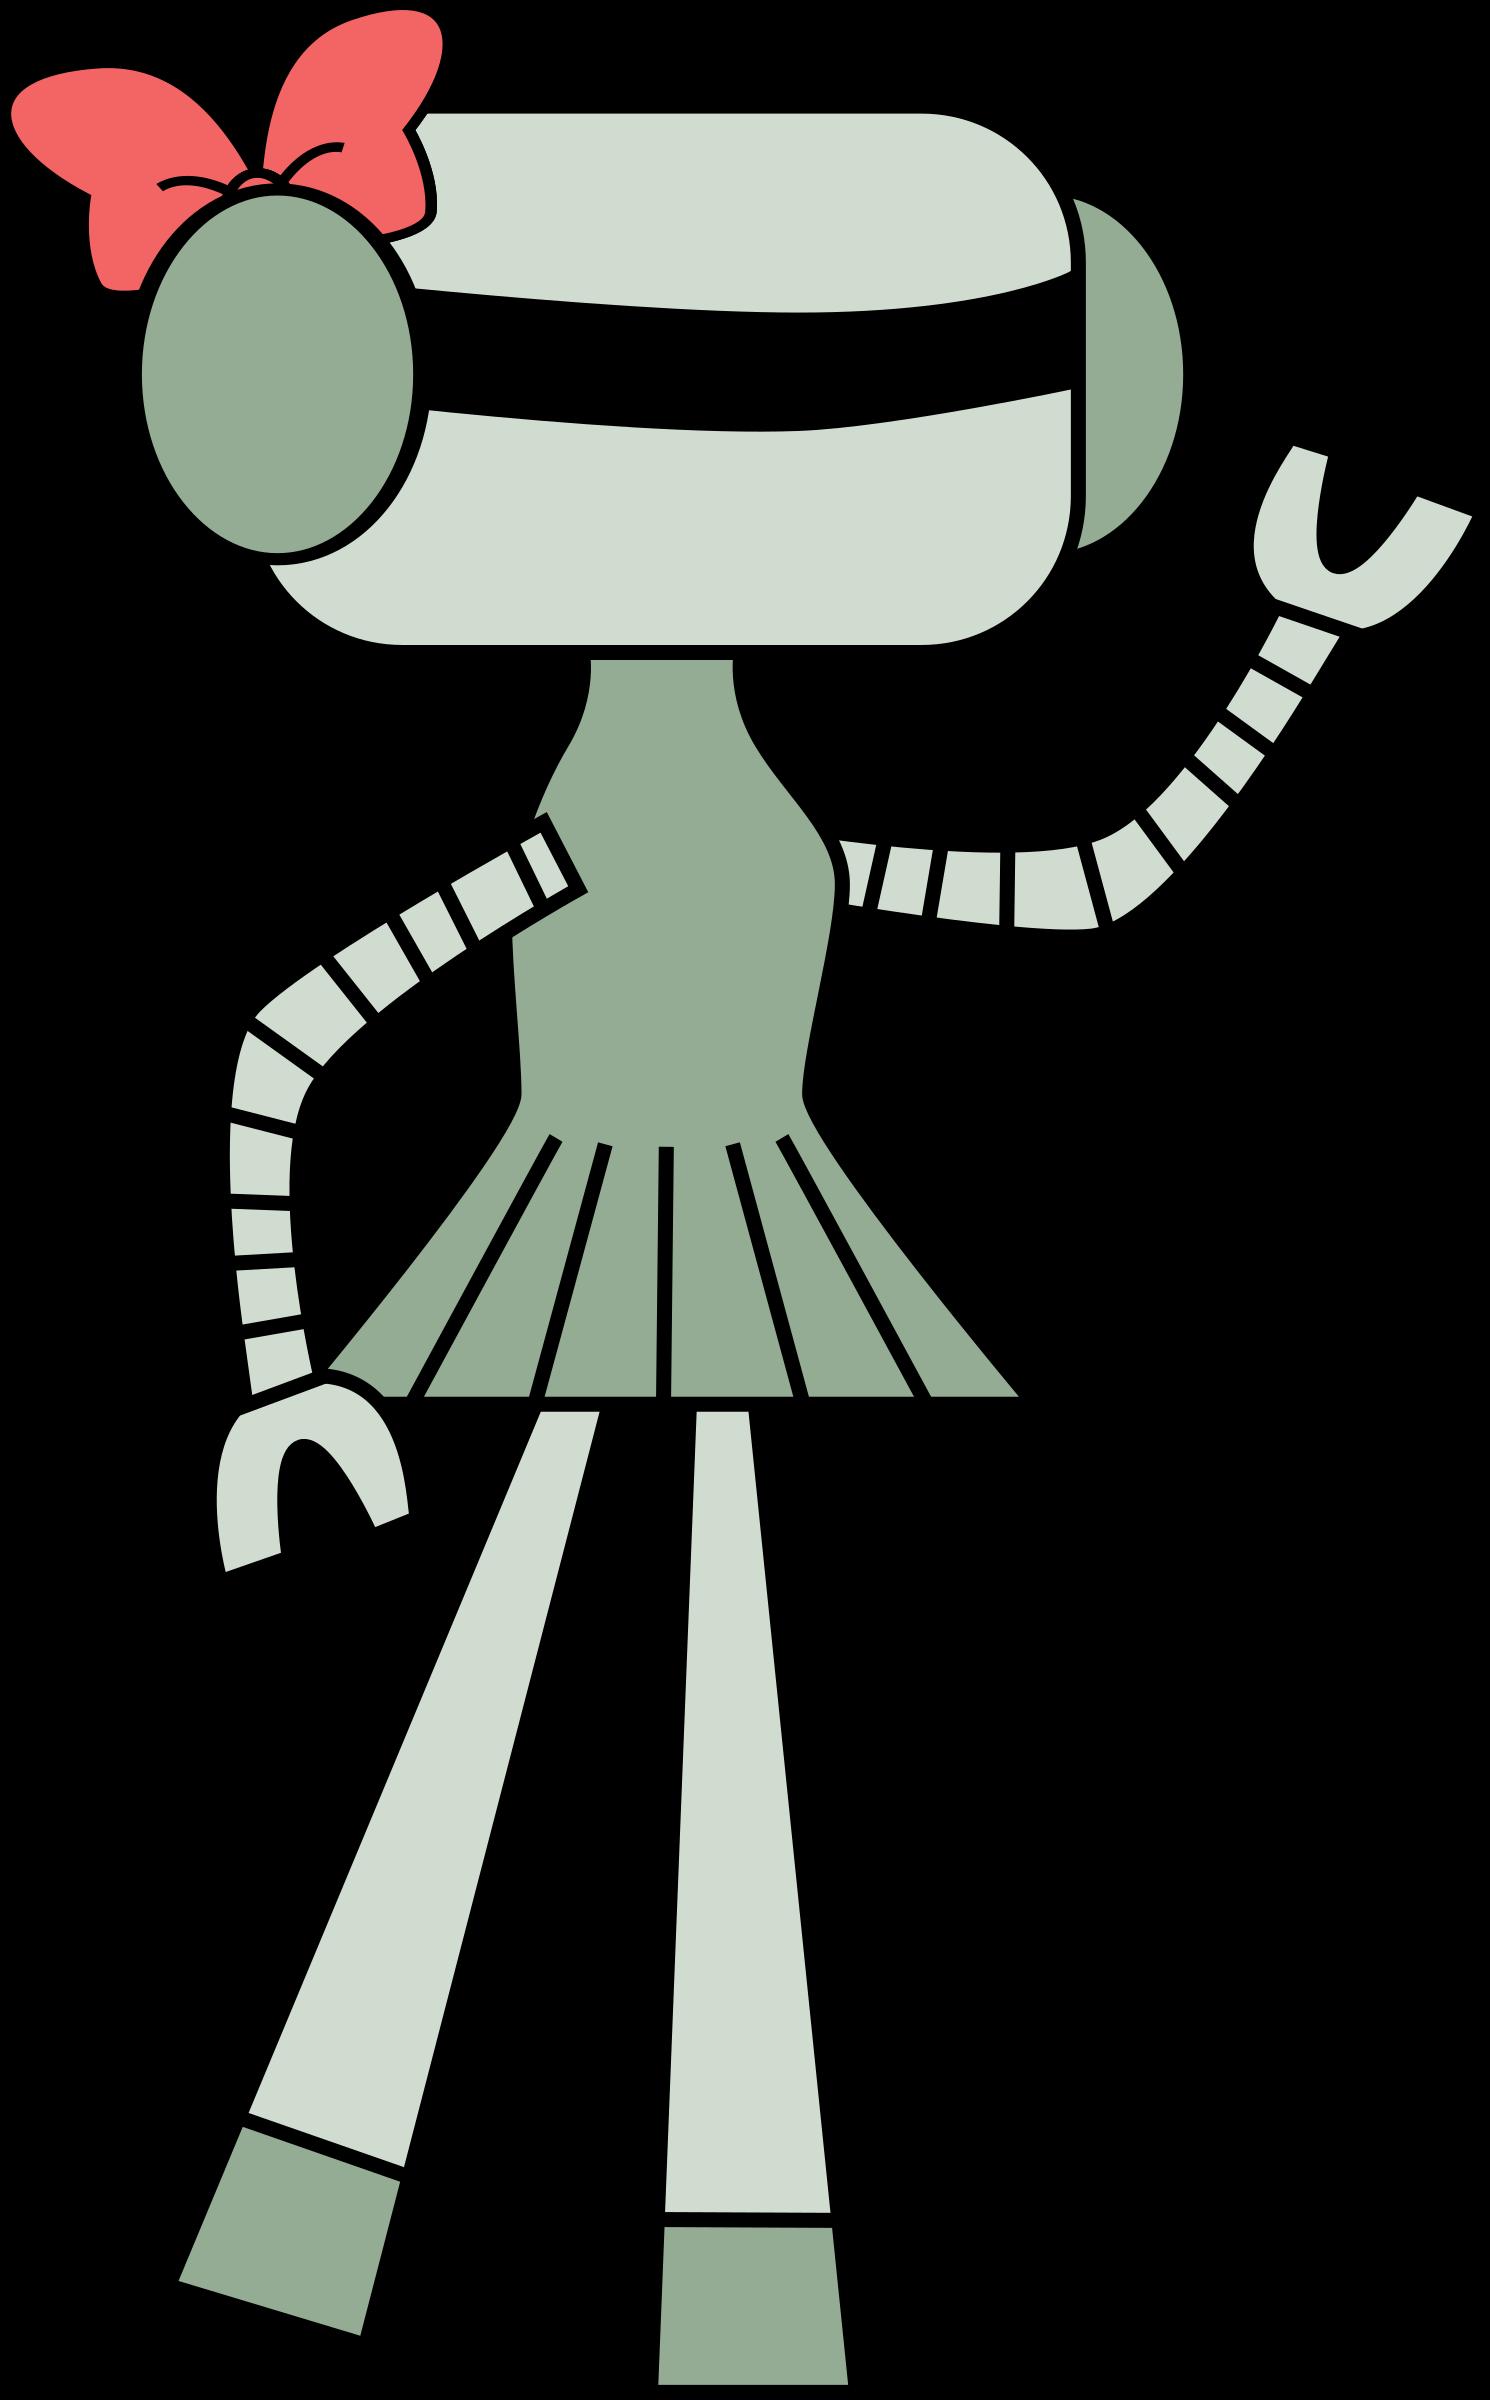 Girl Robot Clipart - Clipart Kid